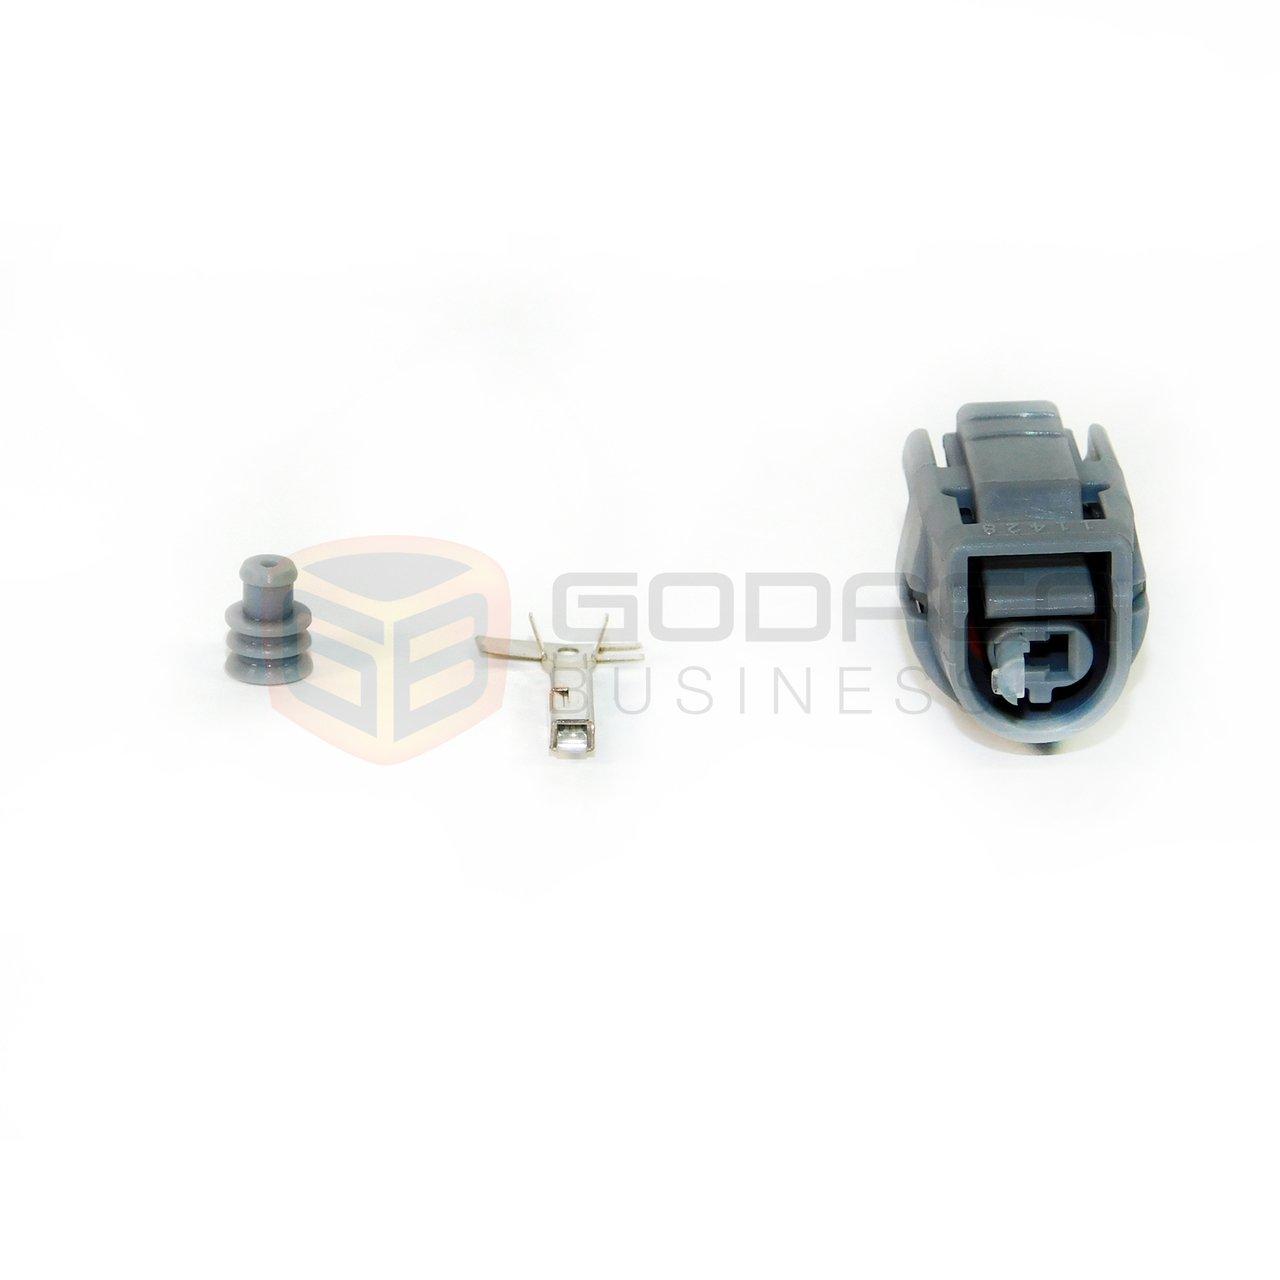 Amazon.com: 1x Connector Temperature sensor for Toyota 2JZ 90980-11428  w/out wire: Automotive